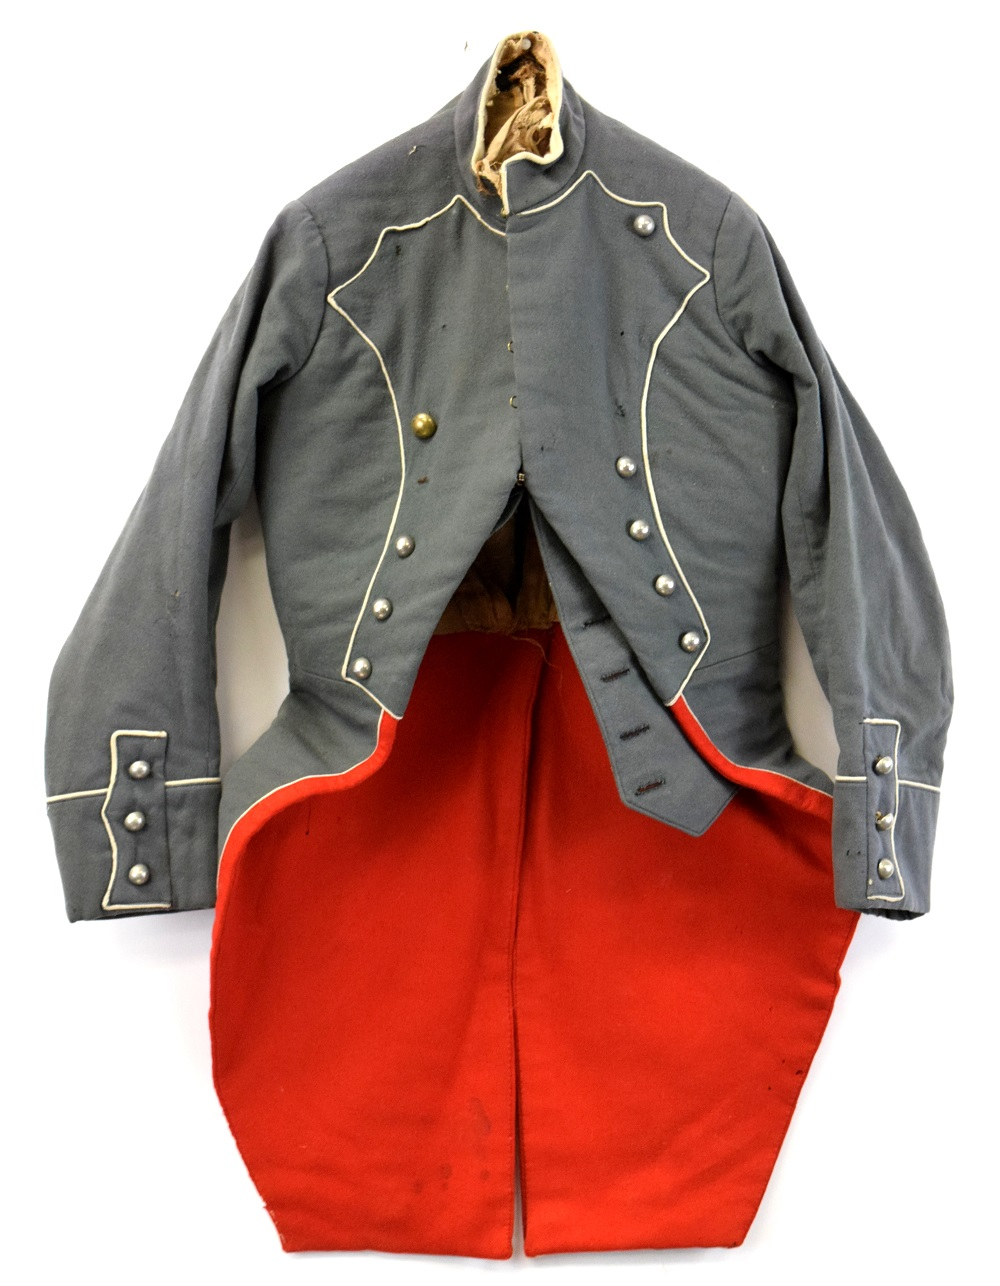 19th C. French Military Uniform Tunic possibly Grenadier